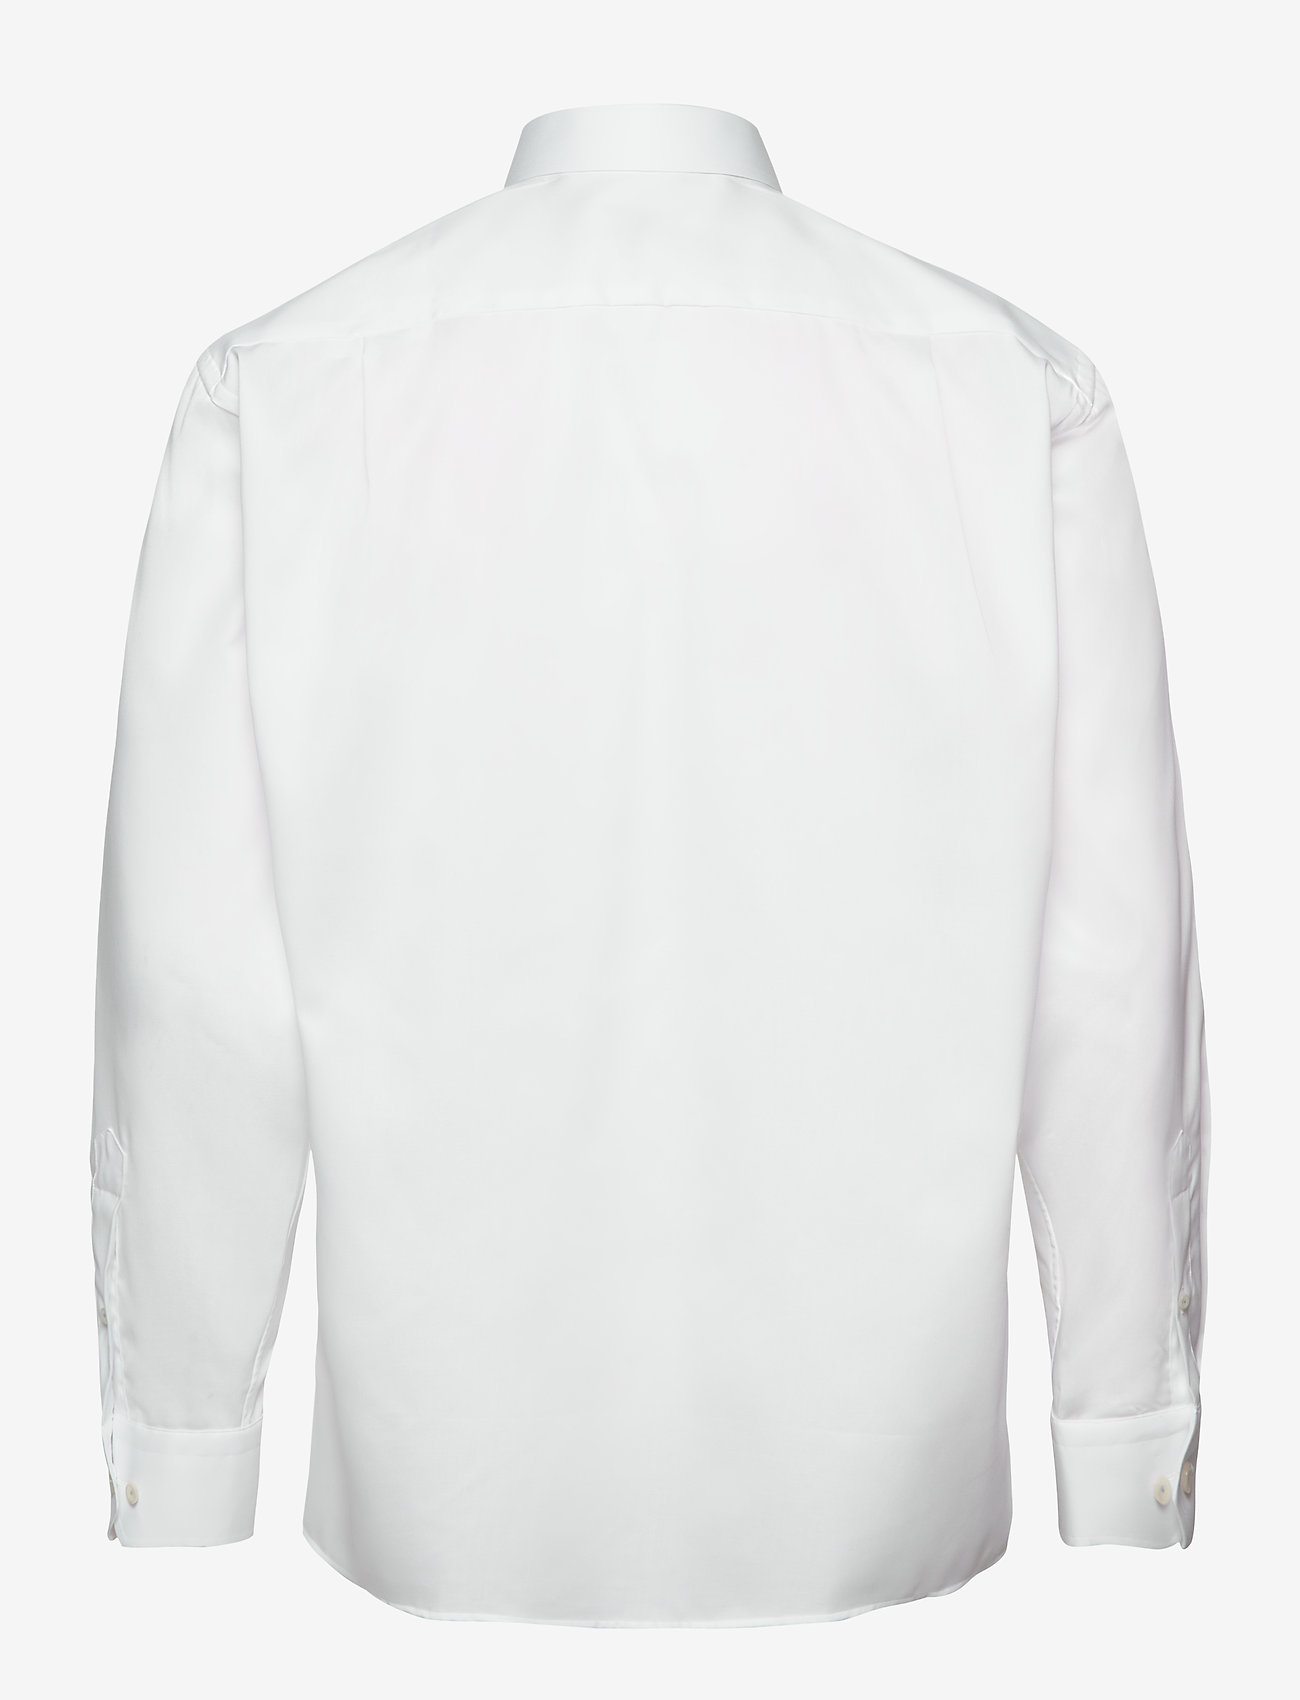 Eton White Royal Twill Shirt - Shirts